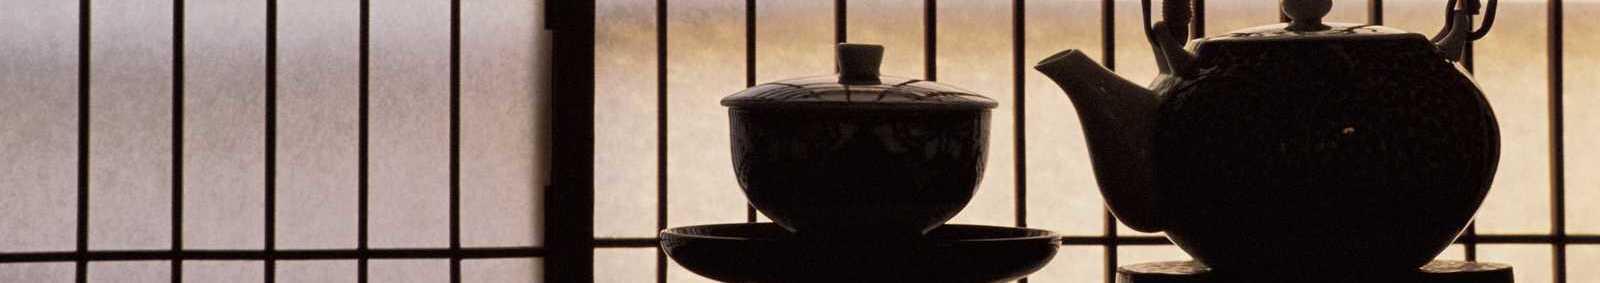 Japanese tea pot